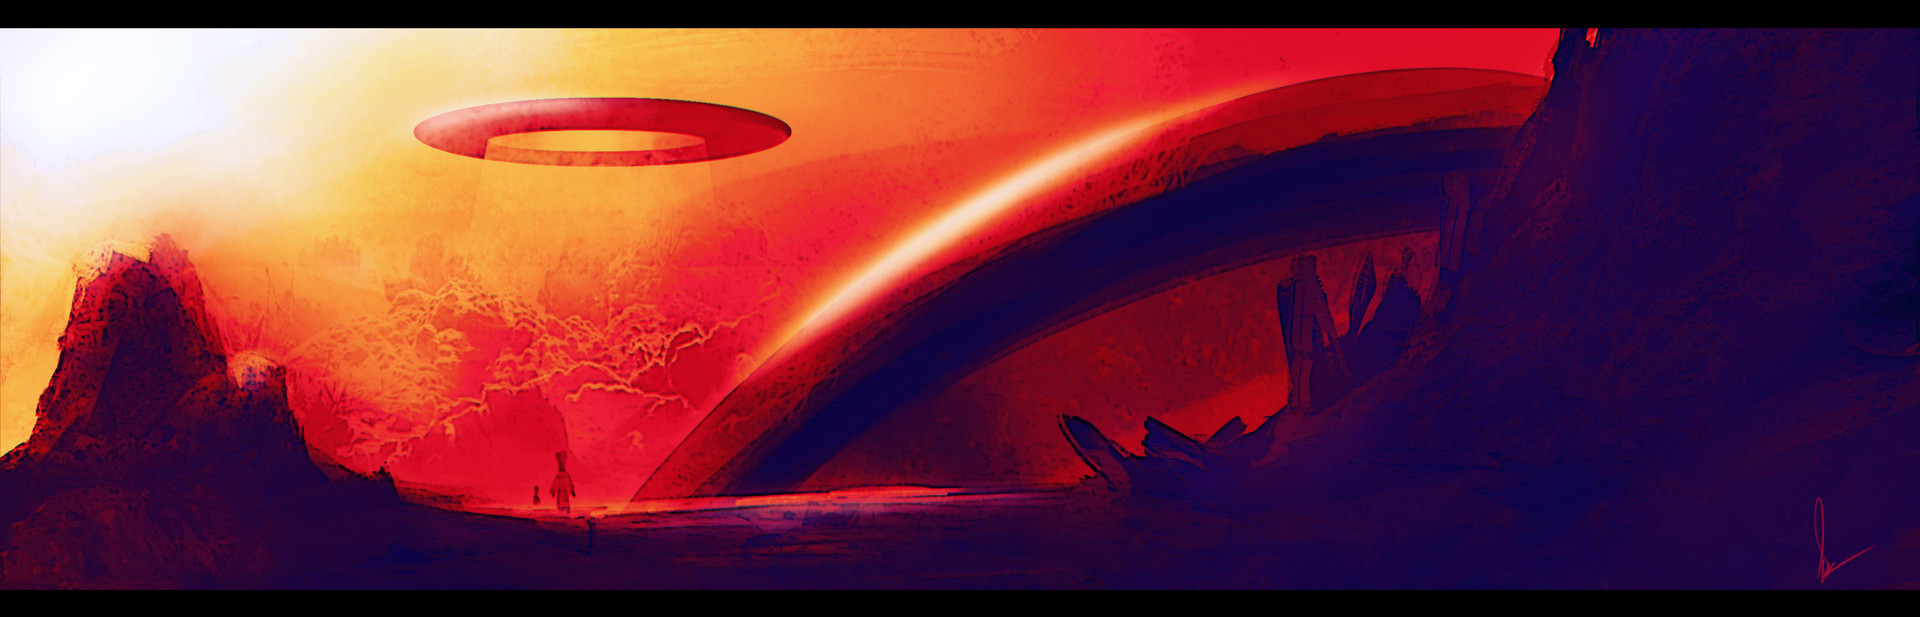 Shwetank shukla painting class alien world one